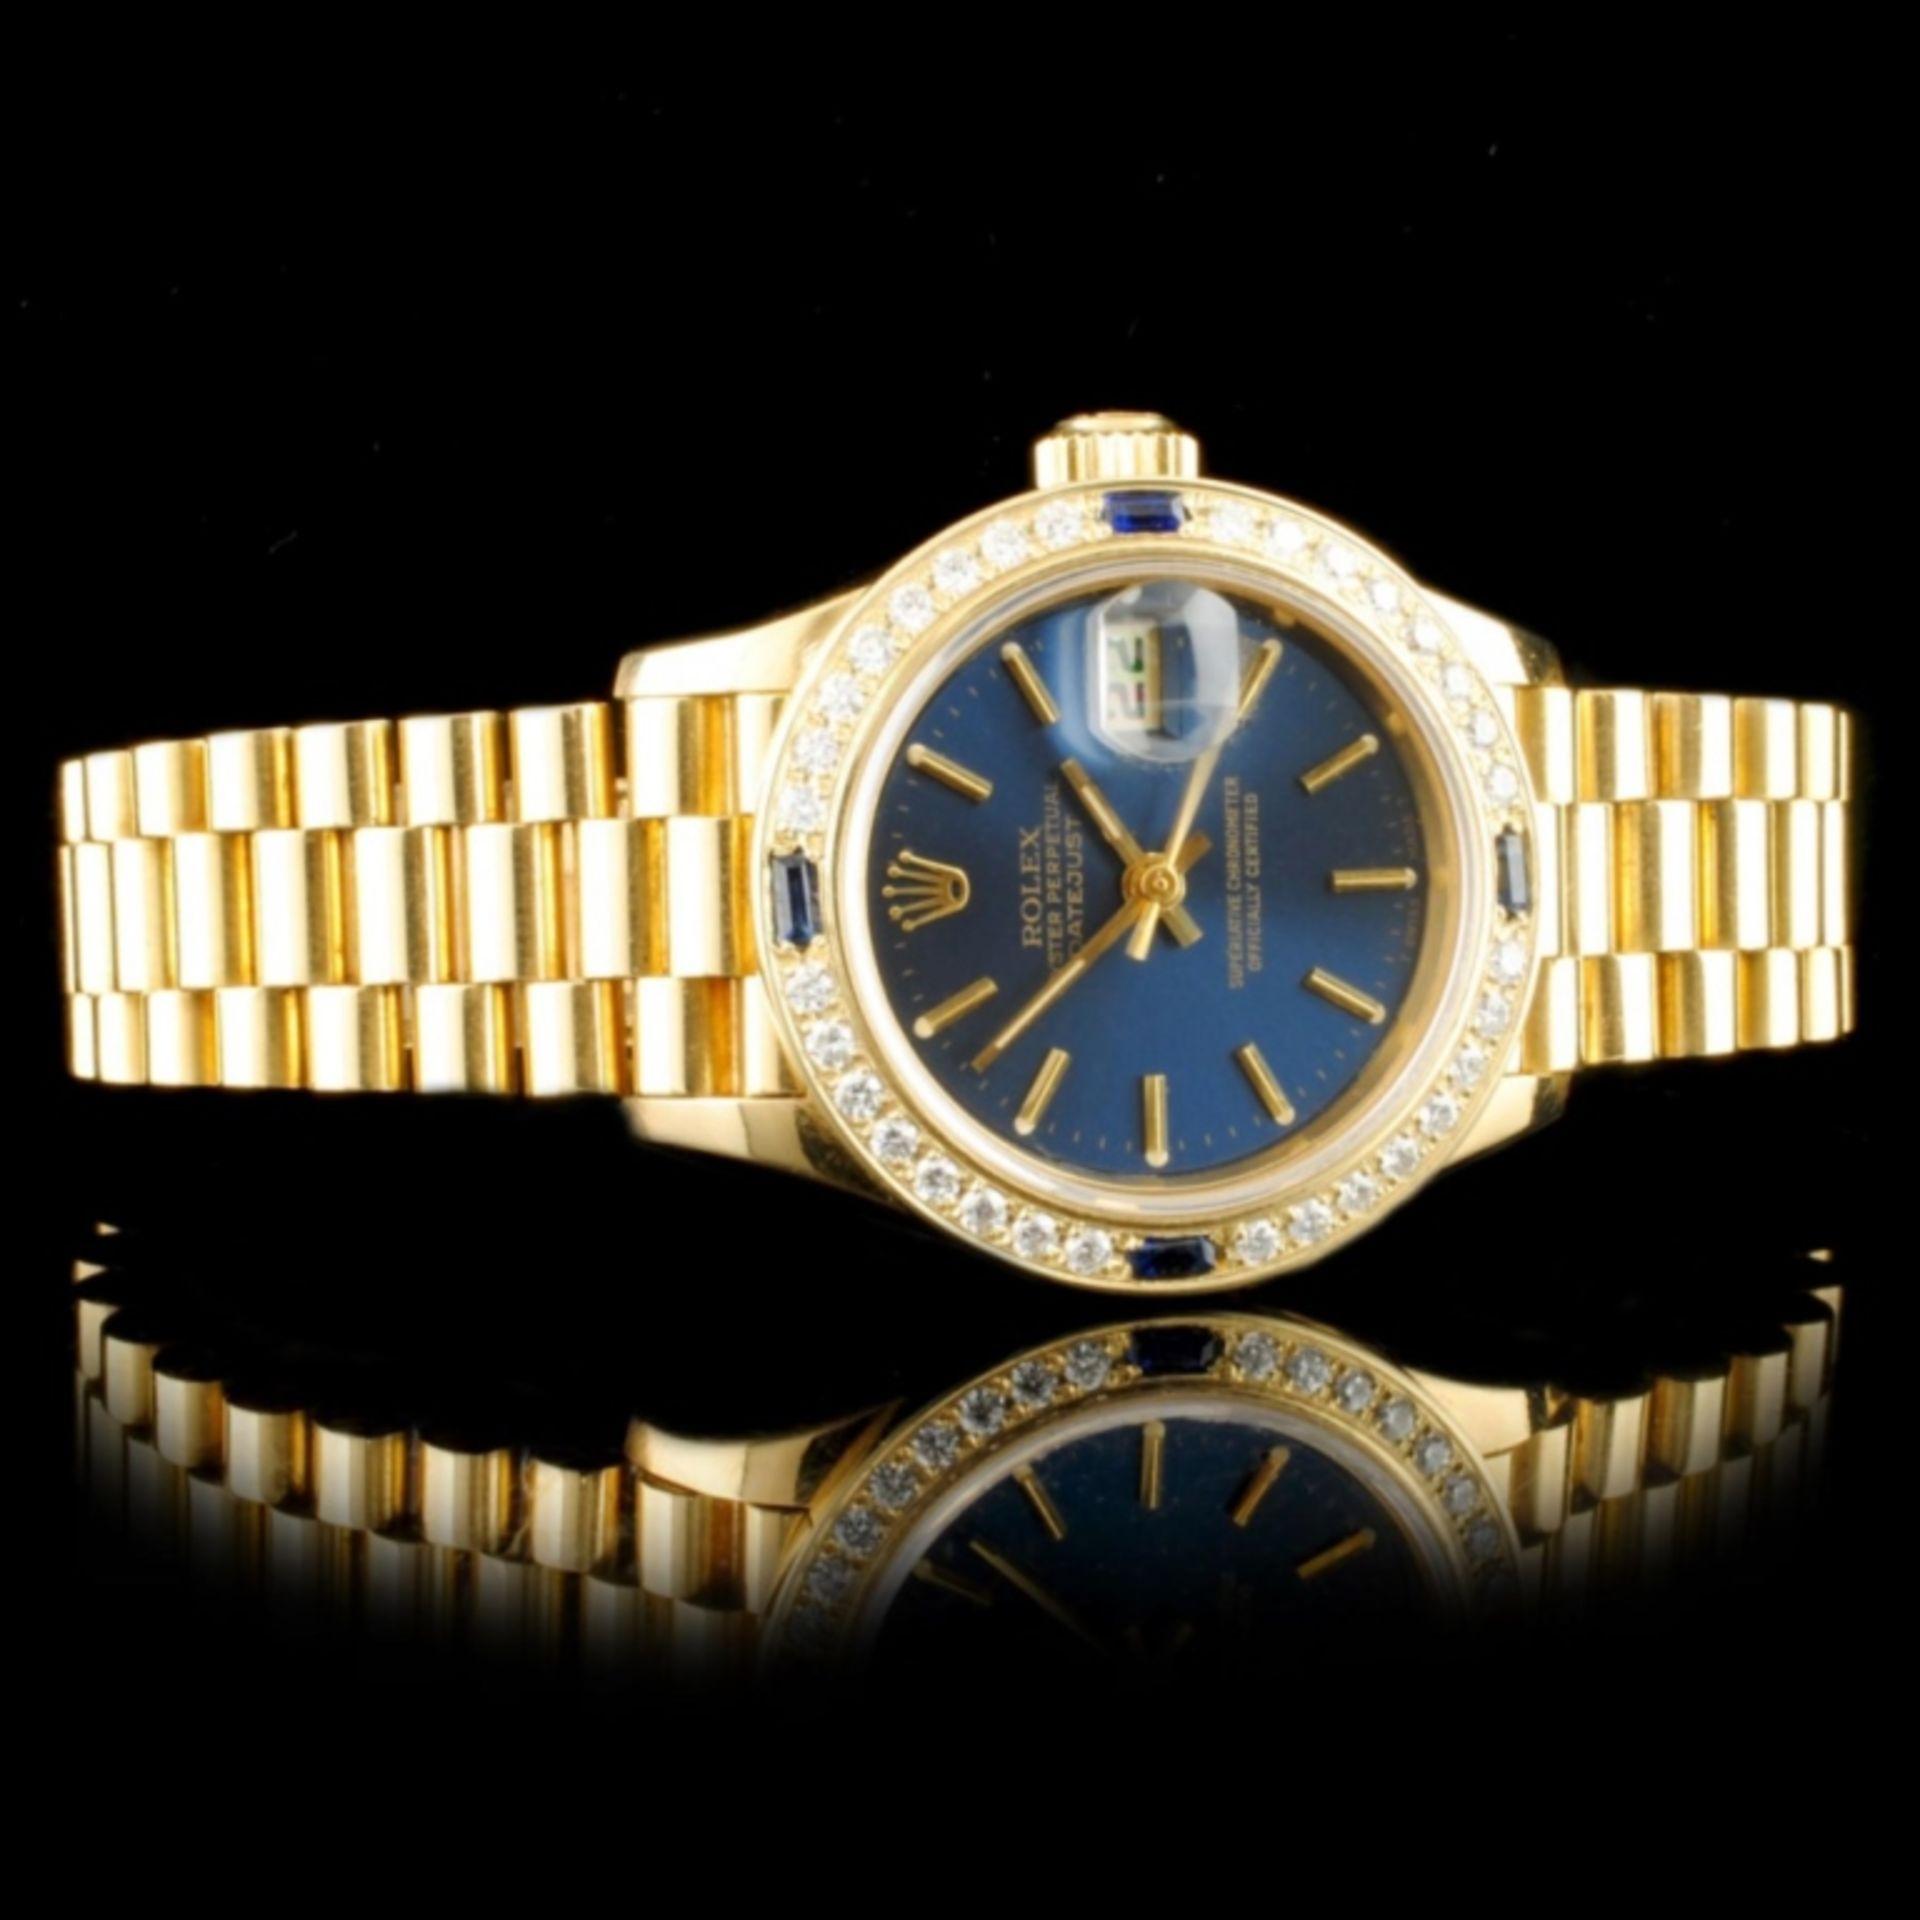 Rolex DateJust 18K YG Diamond 26MM Watch - Image 3 of 6